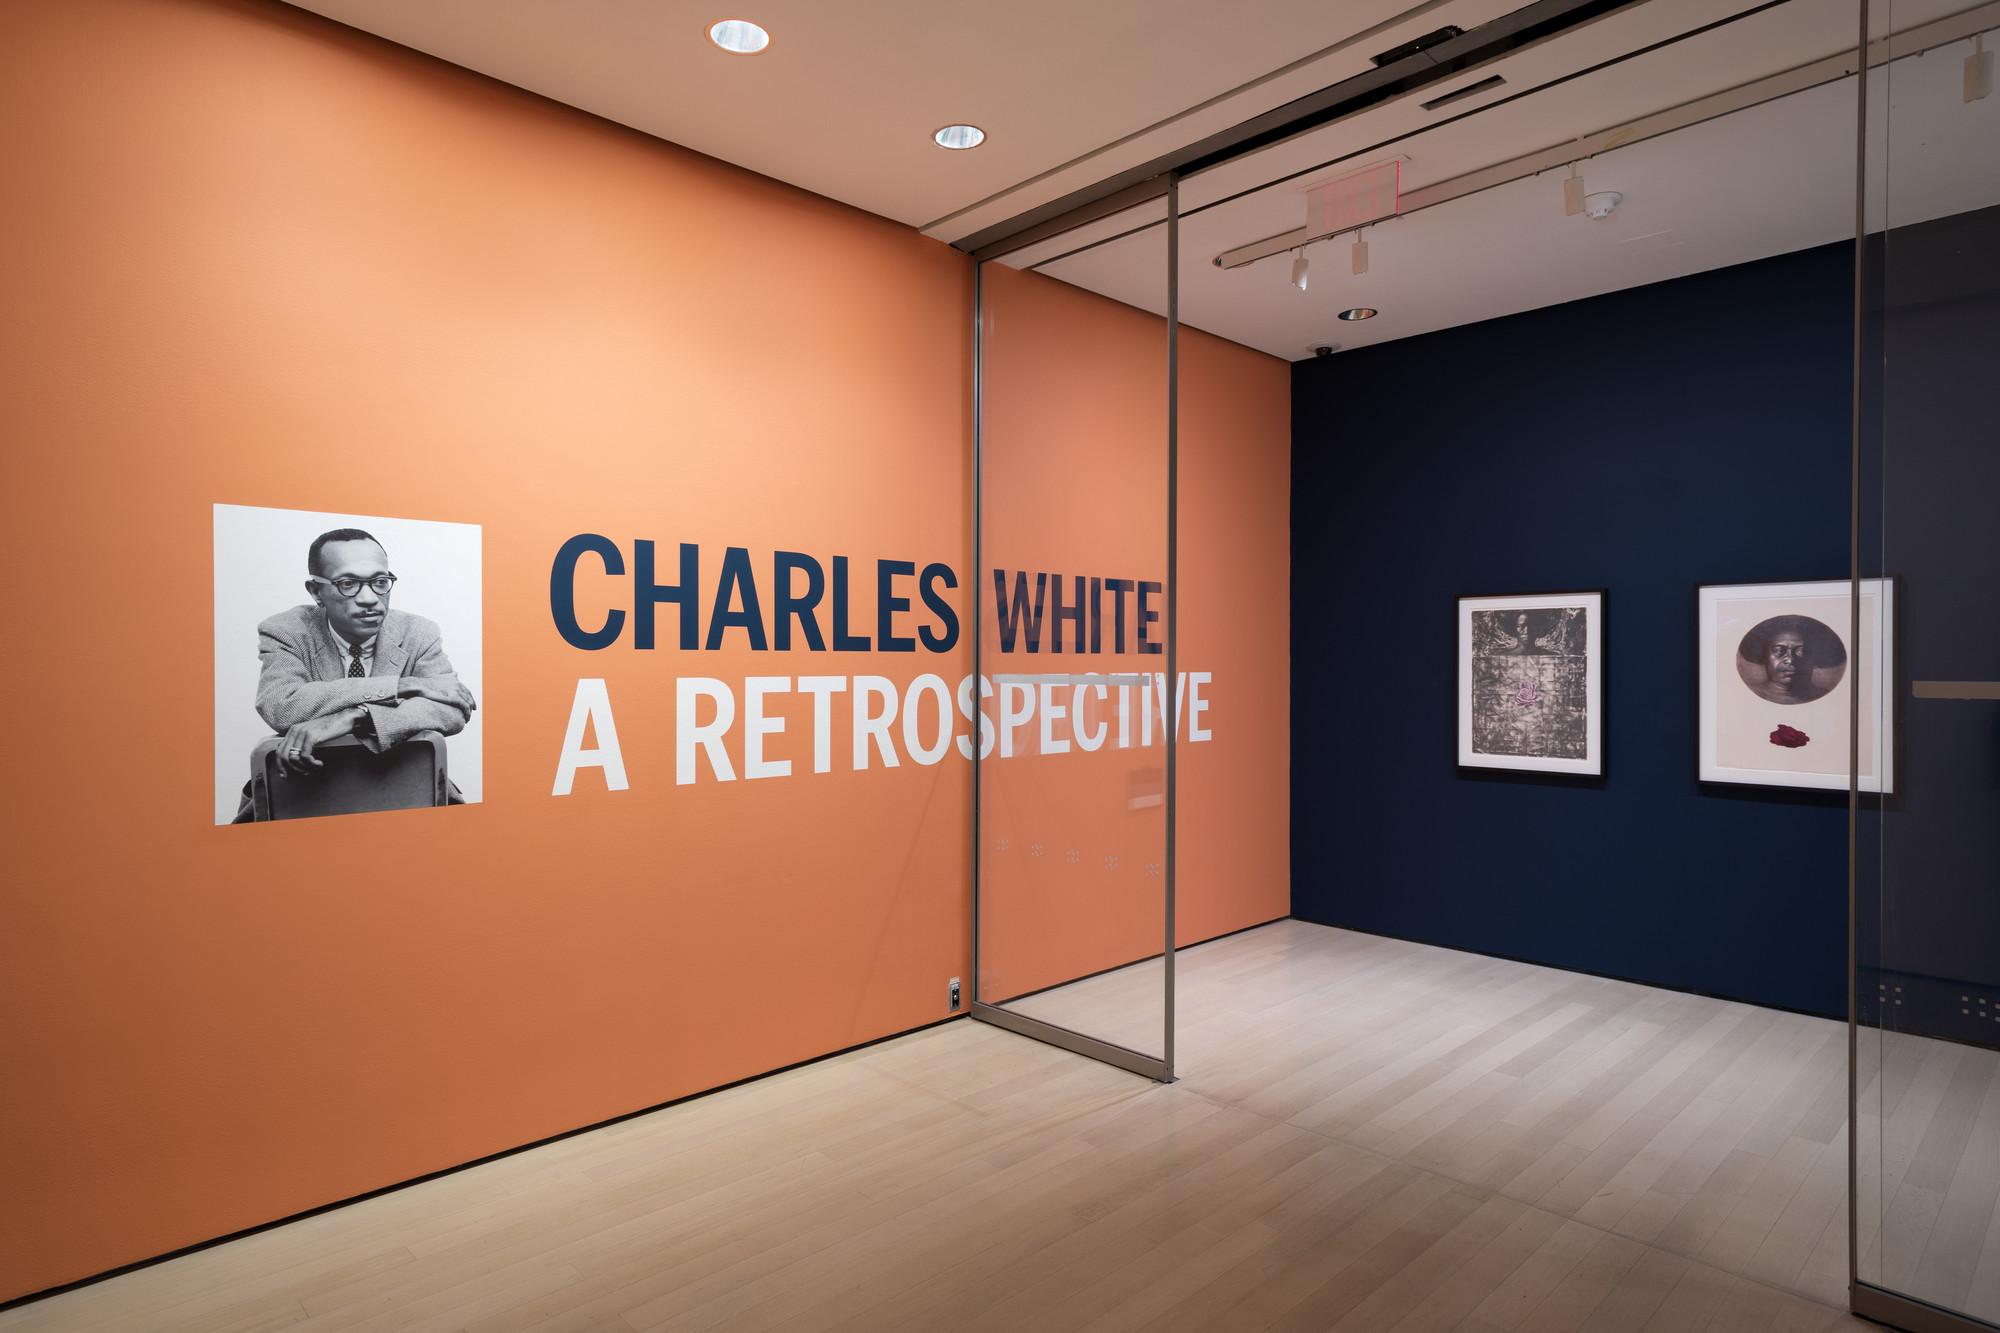 Charles White A Retrospective Moma